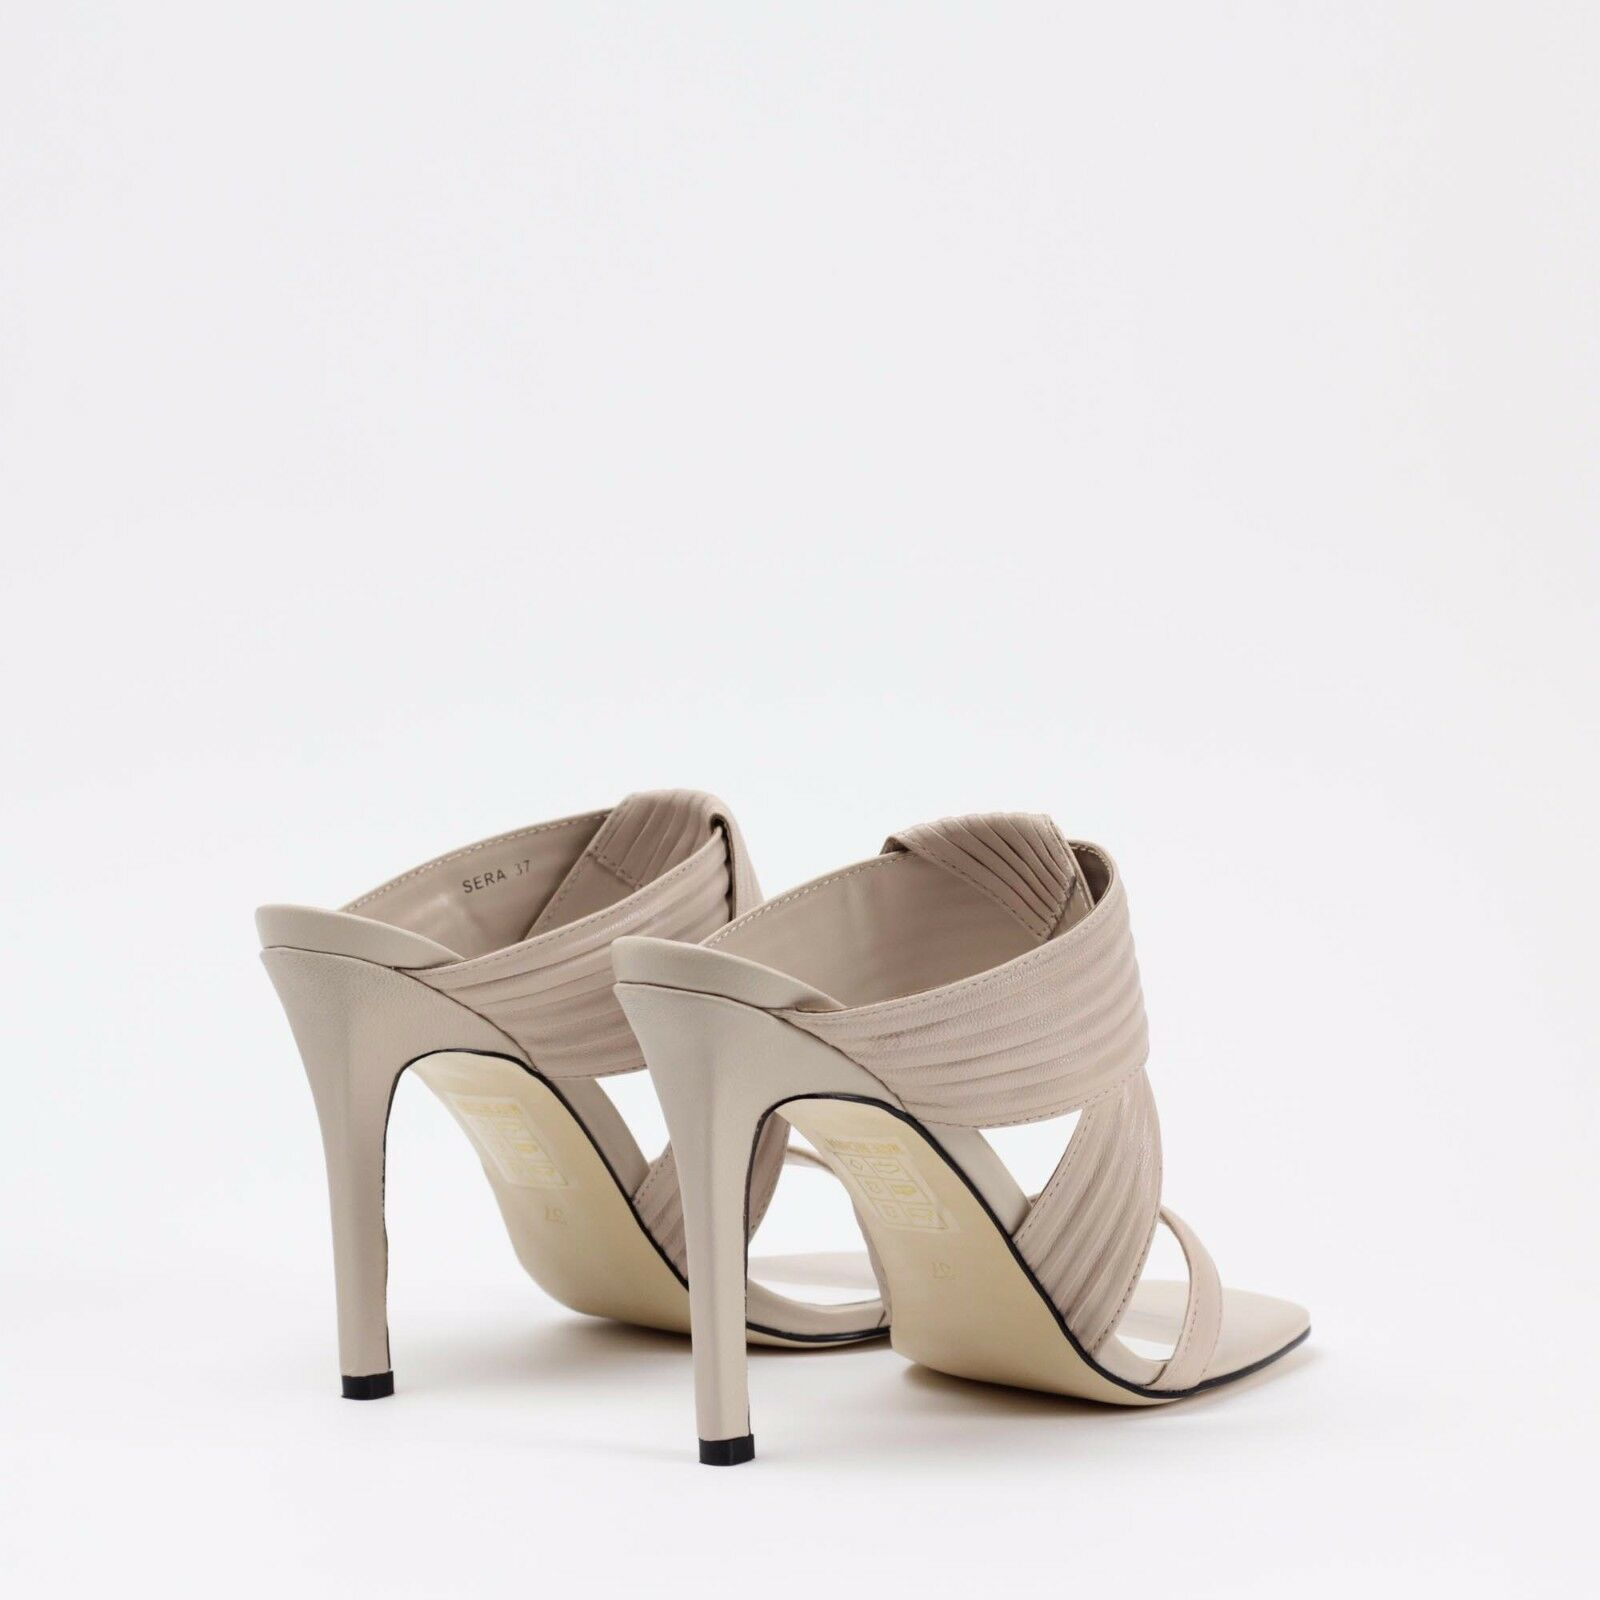 Senso Sera II Nude Beige Matt Kid Leder High High High Mule Sandale Summer Schuhe 594c4a